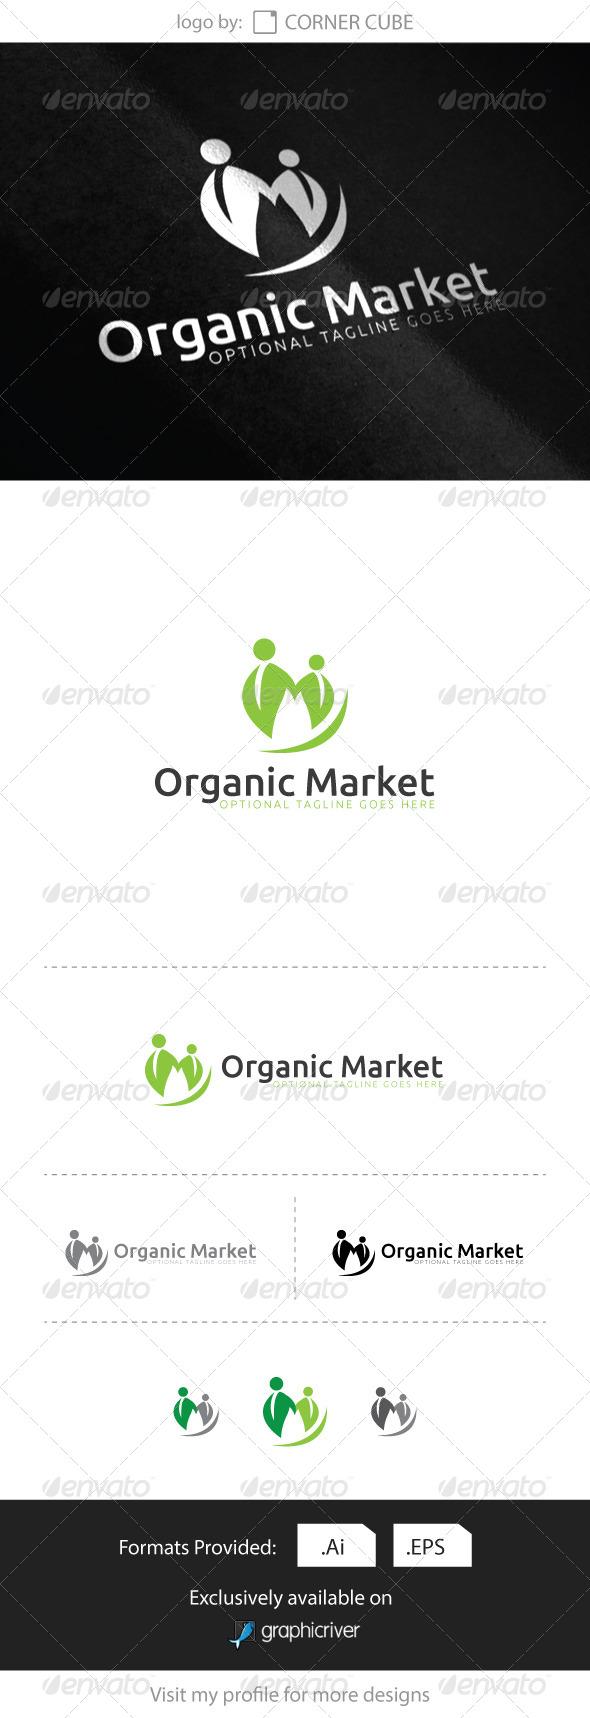 GraphicRiver Organic Market Logo 8286508